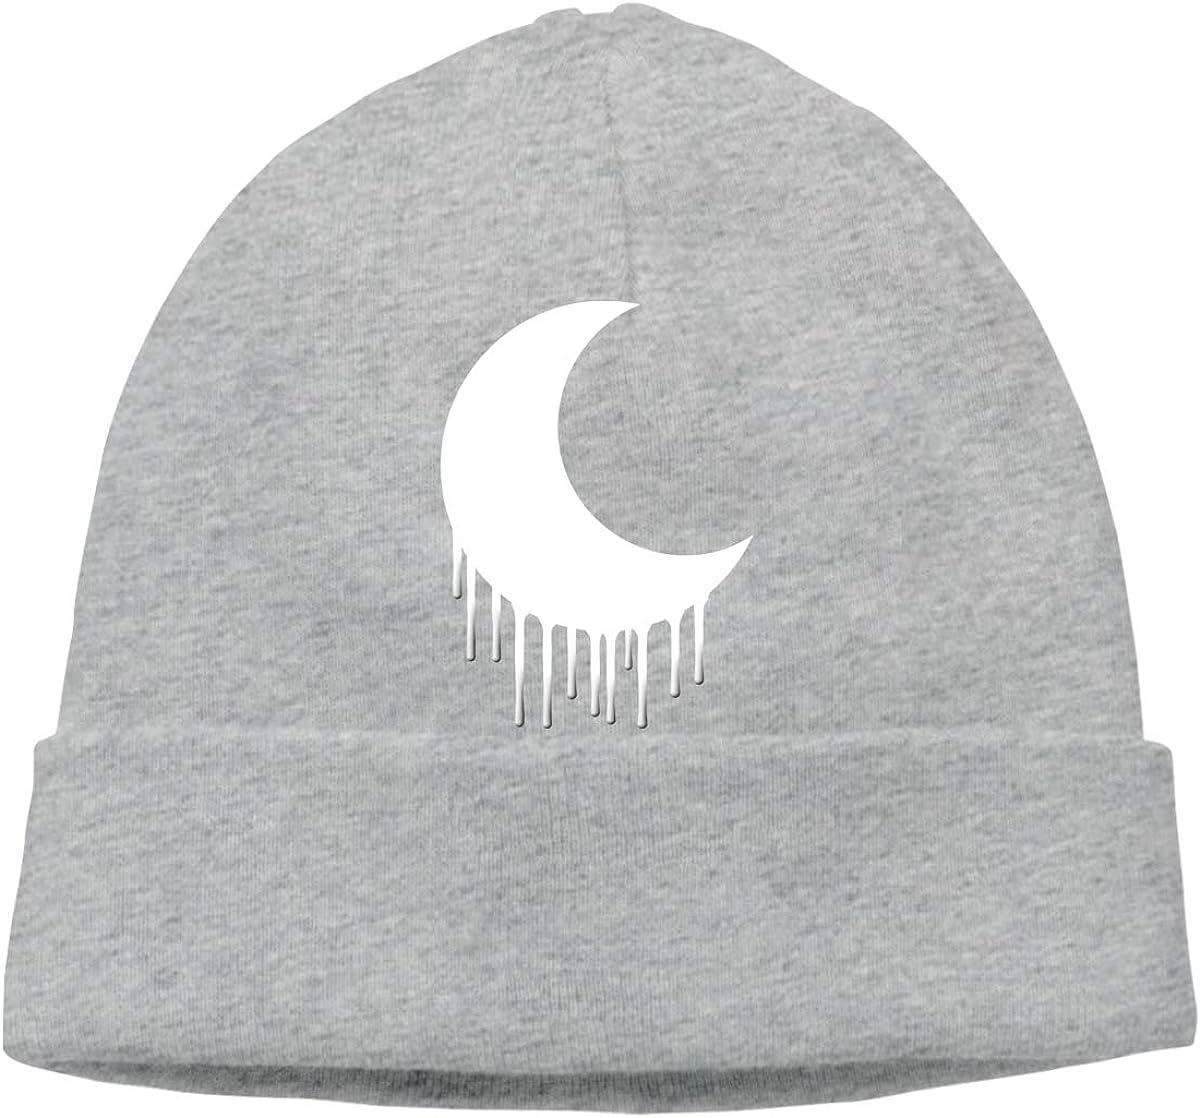 Nichildshoes hat Mesh Caps Hats for Men Women Unisex Print Finger Flag